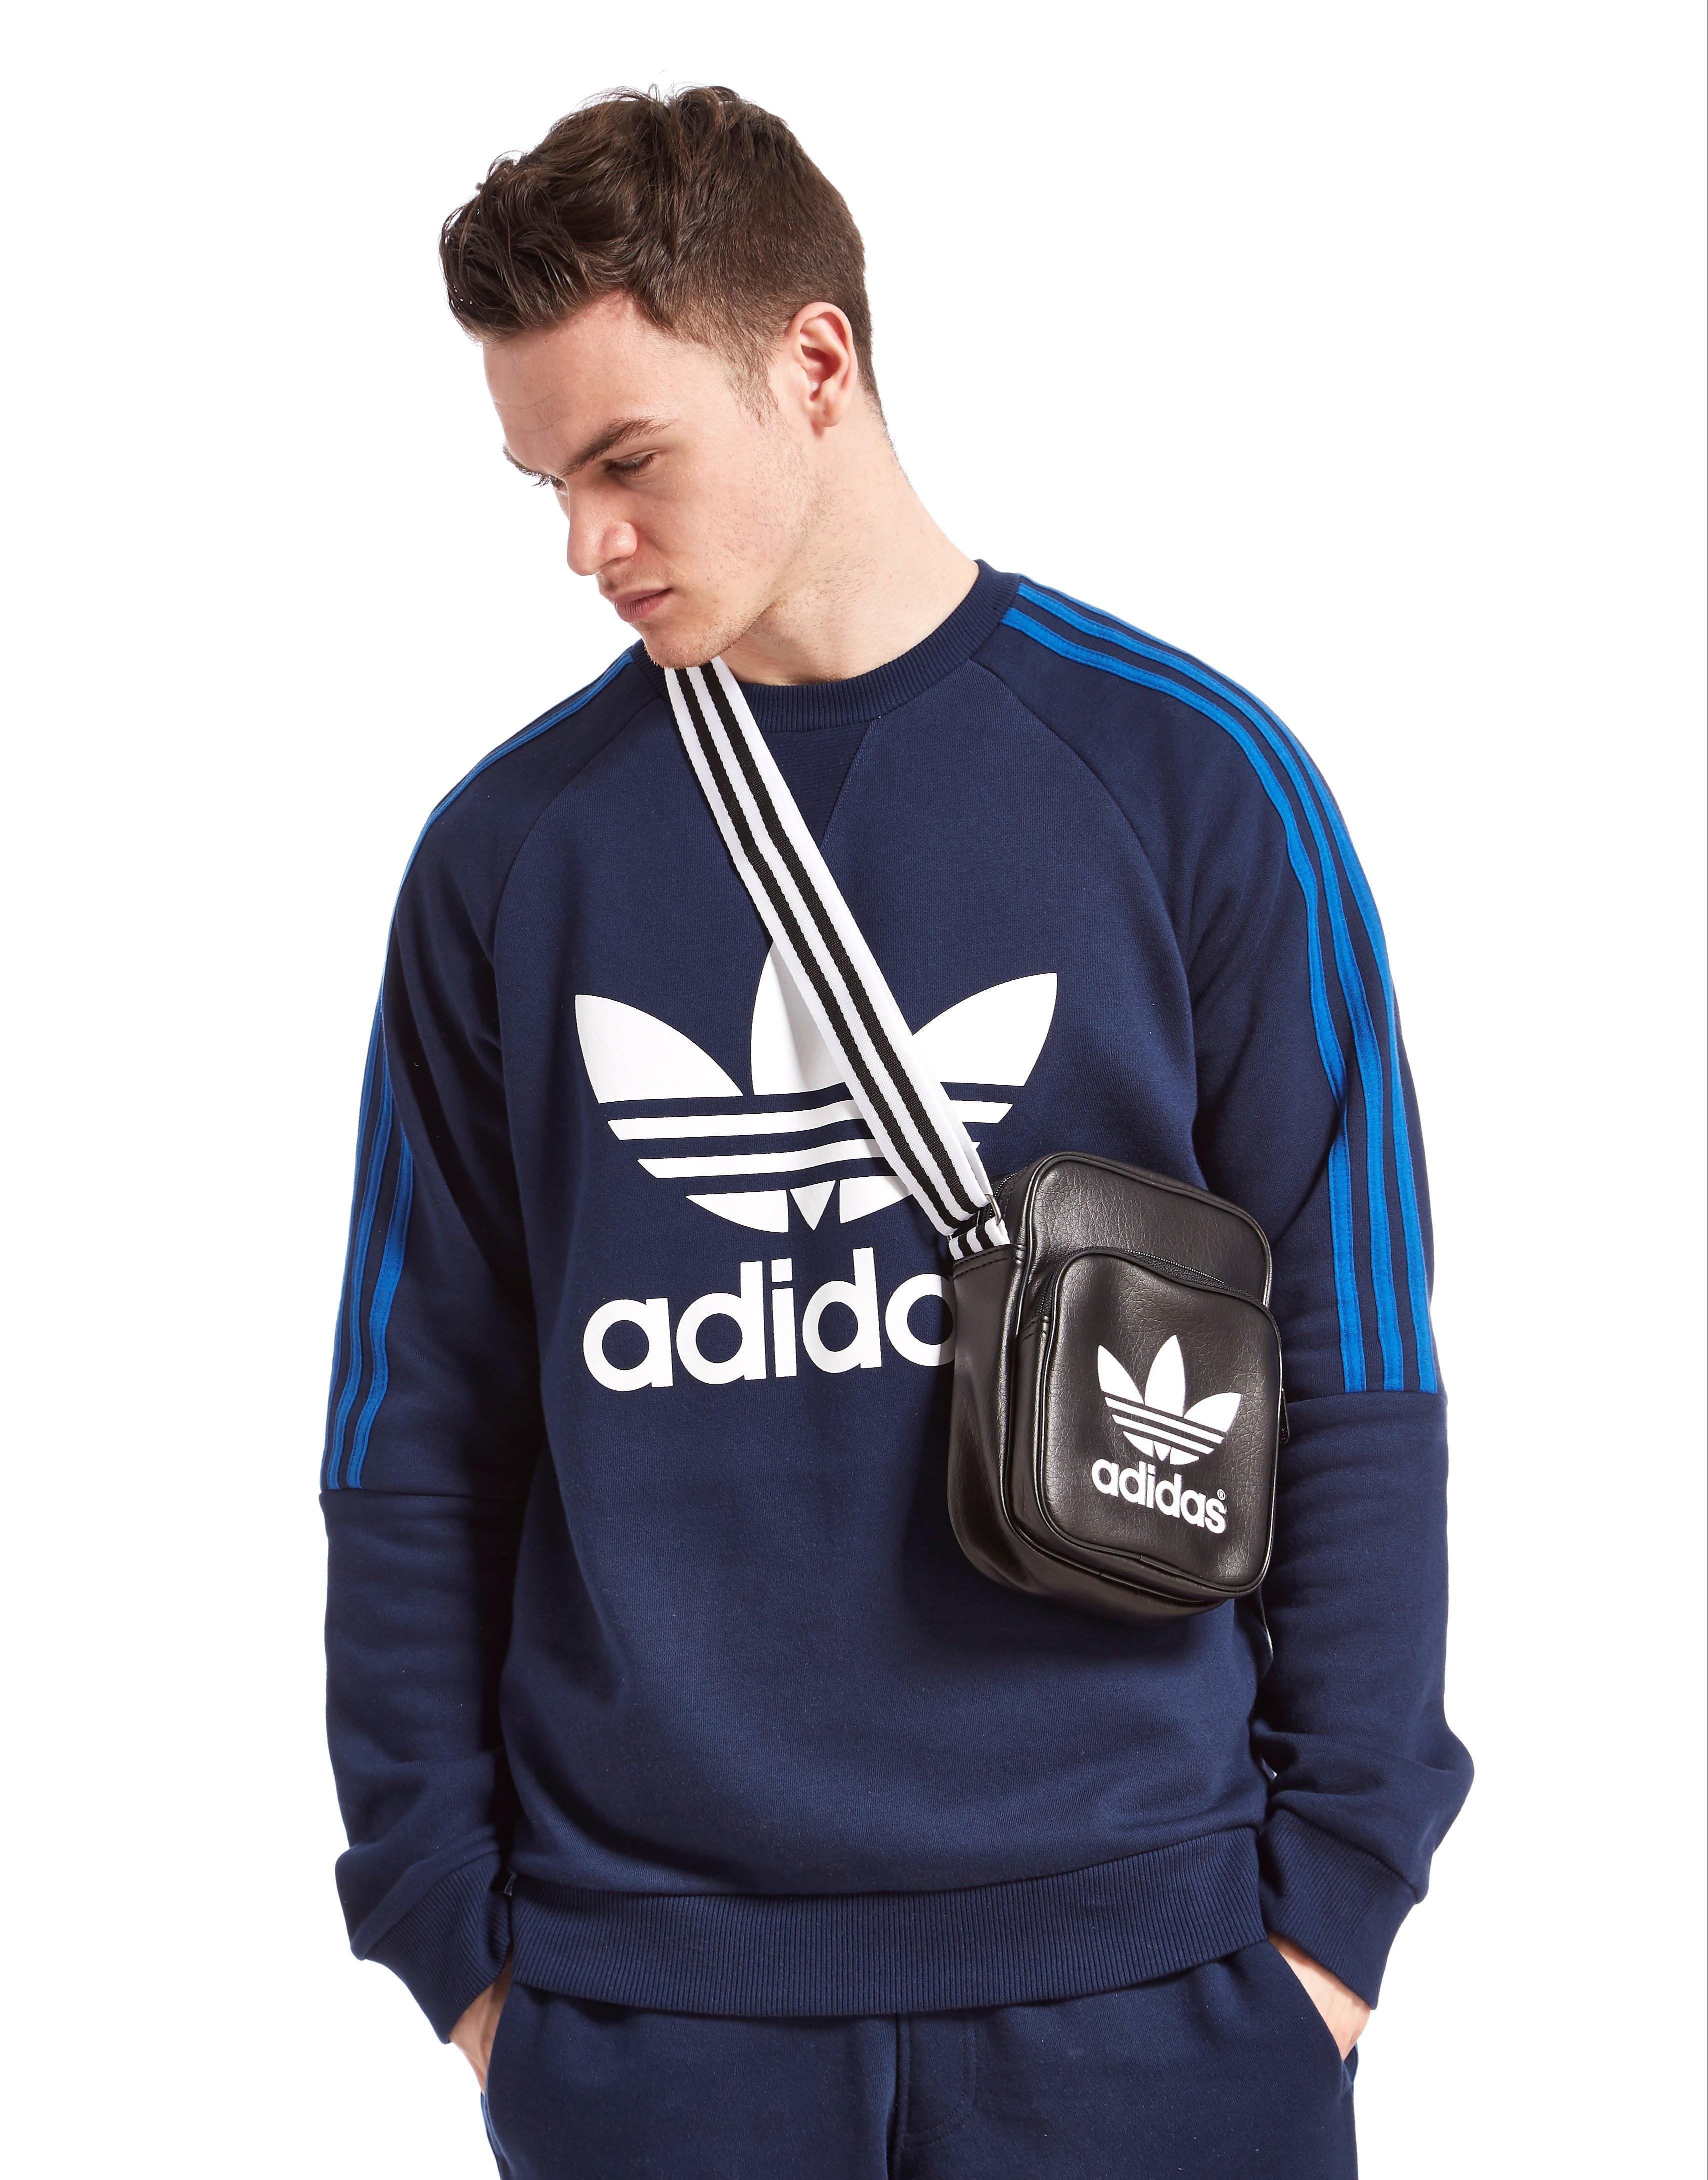 adidas Originals Small Items väska